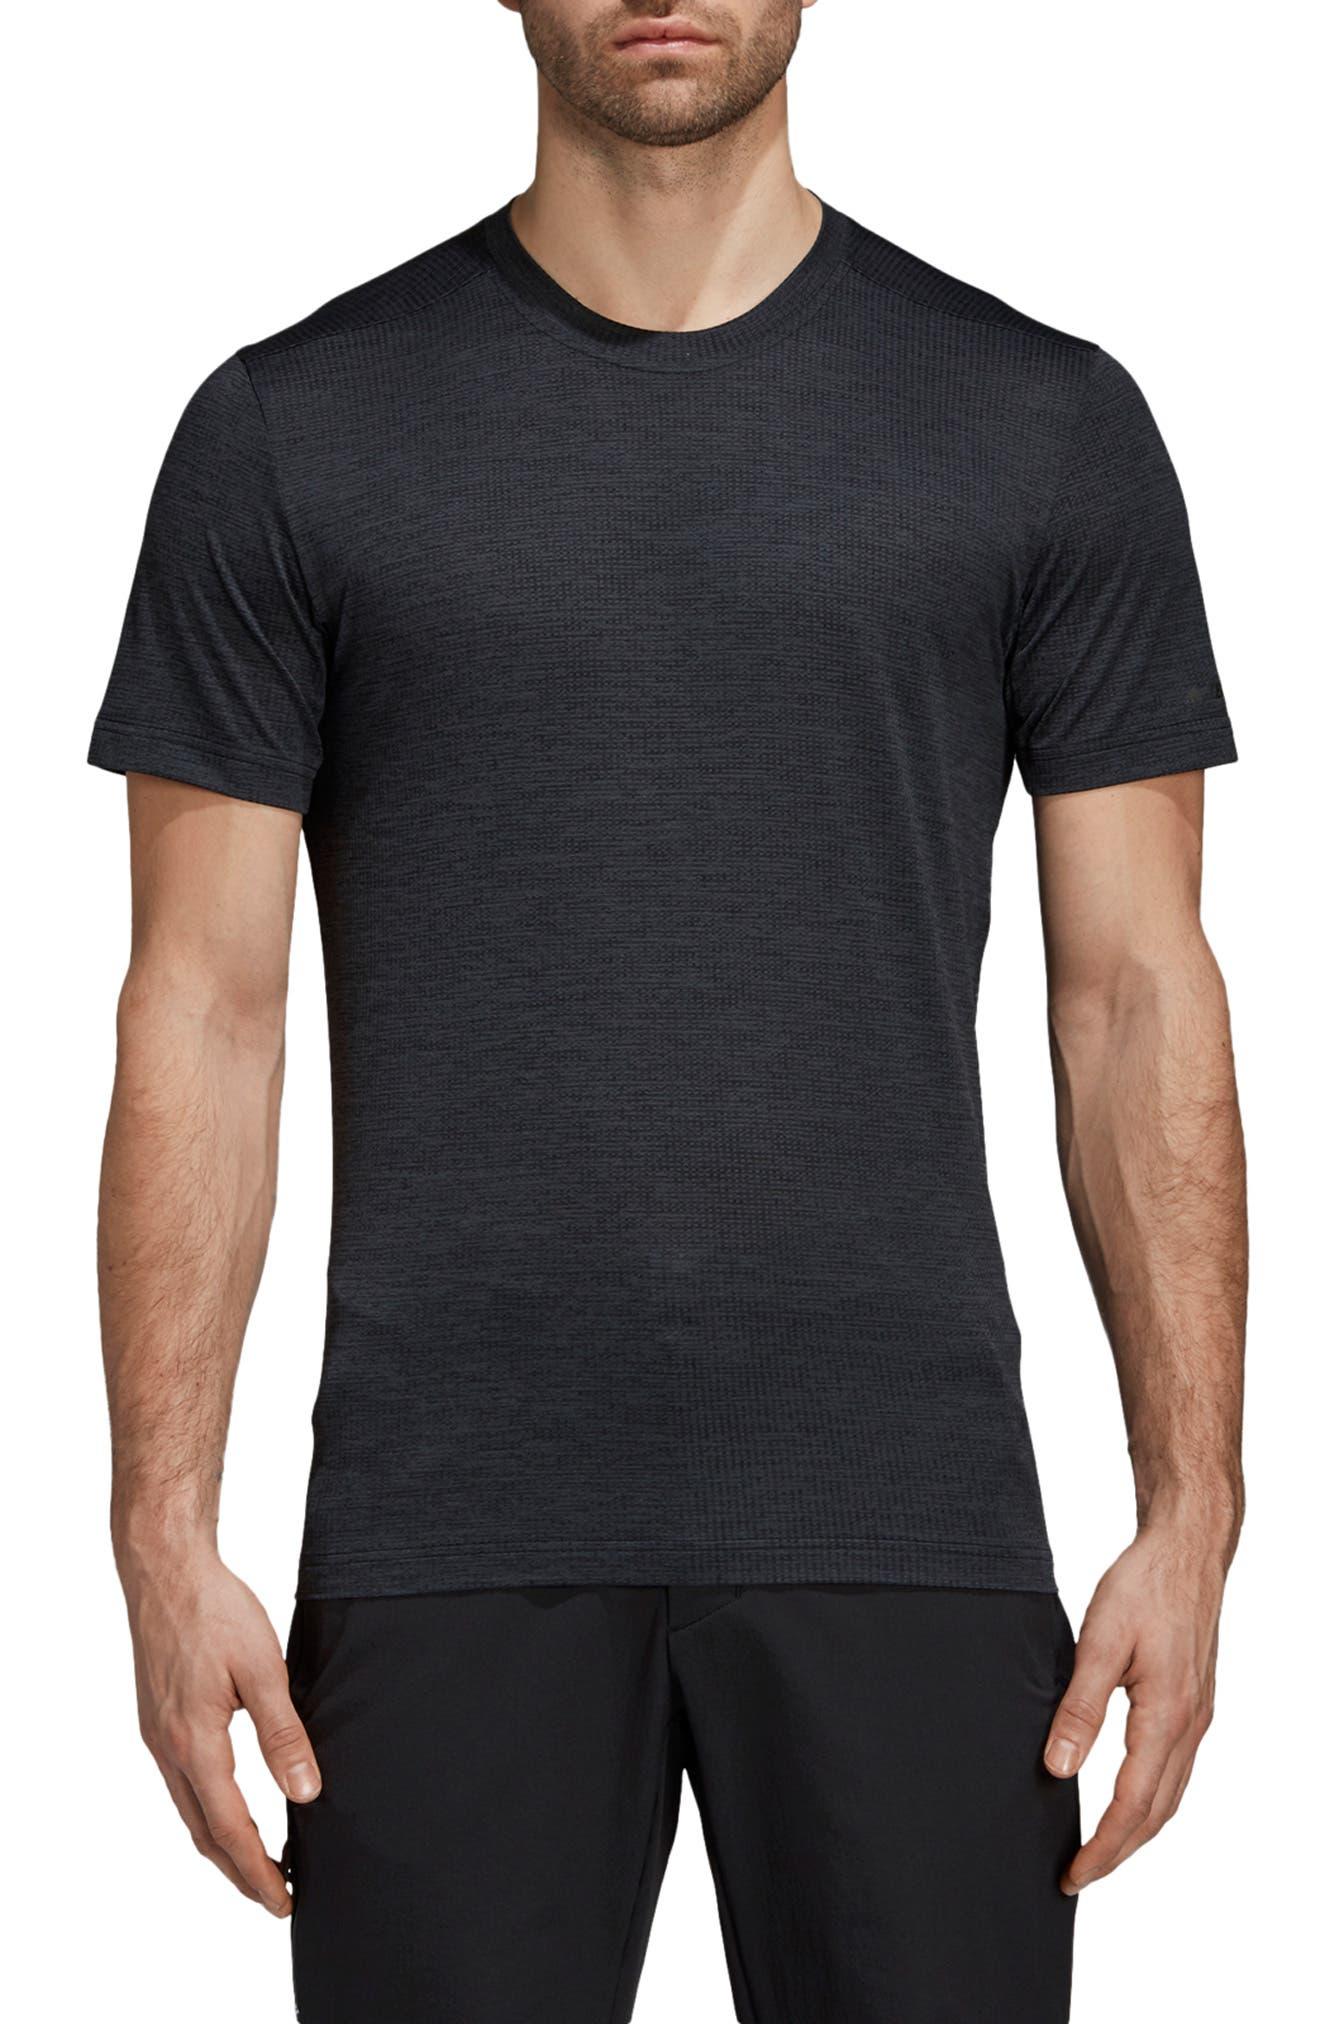 Adidas Tivid Climalite T-Shirt, Grey